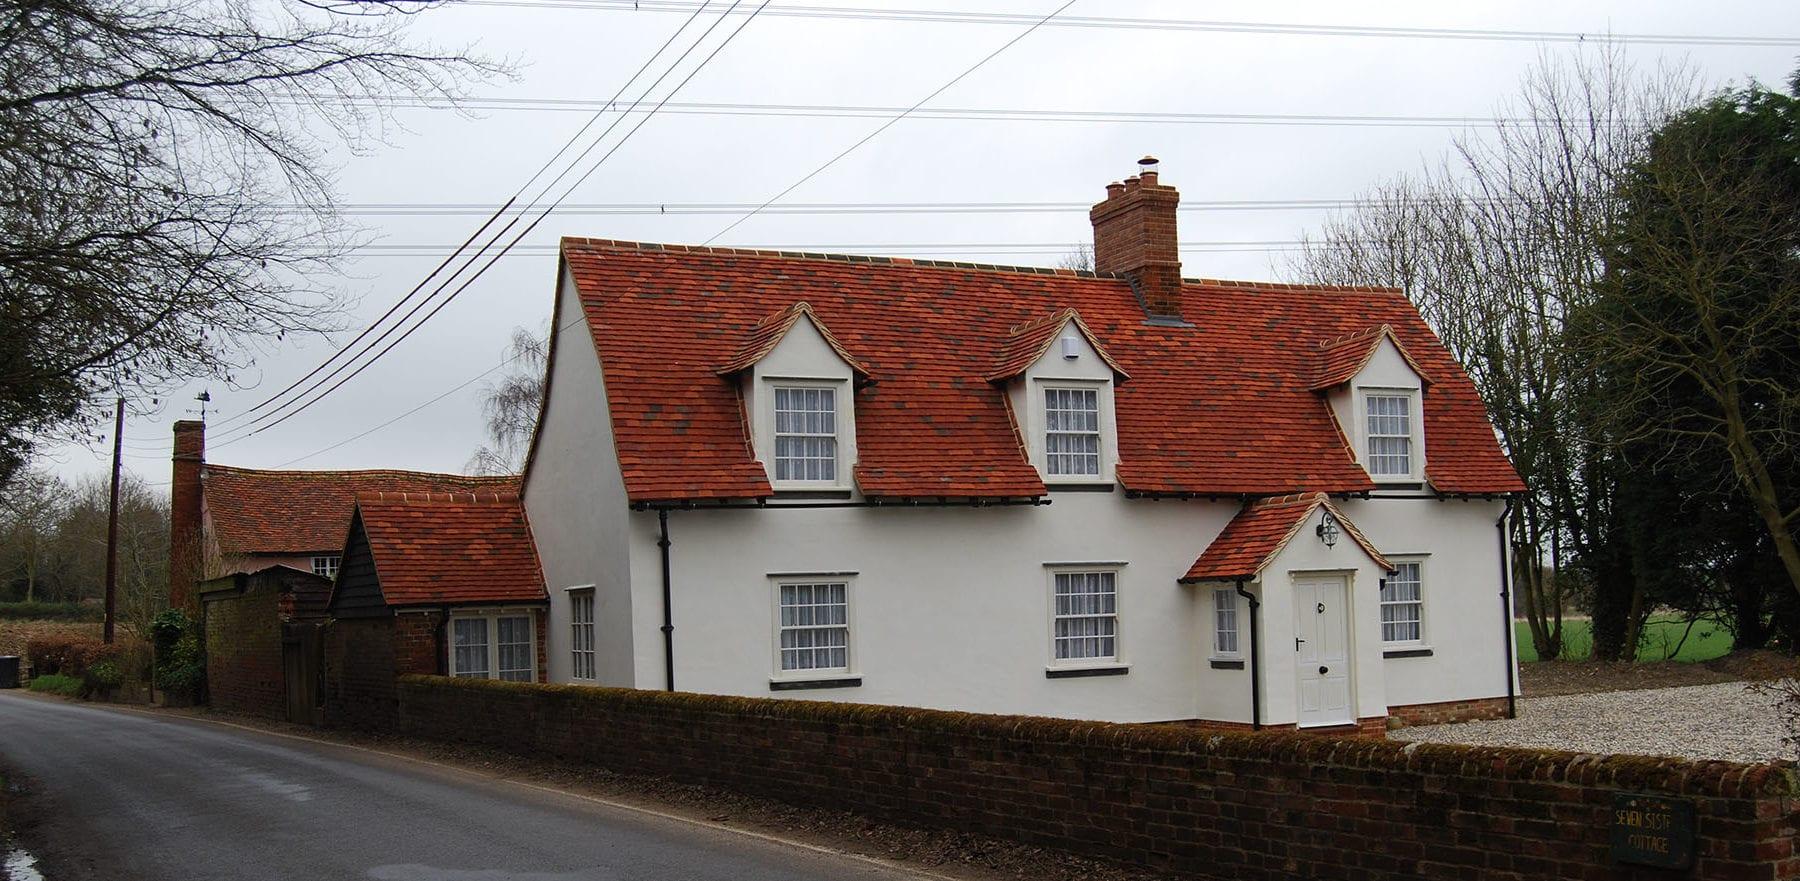 Lifestiles - Handmade Multi Clay Roof Tiles - Gainsford End, England 4